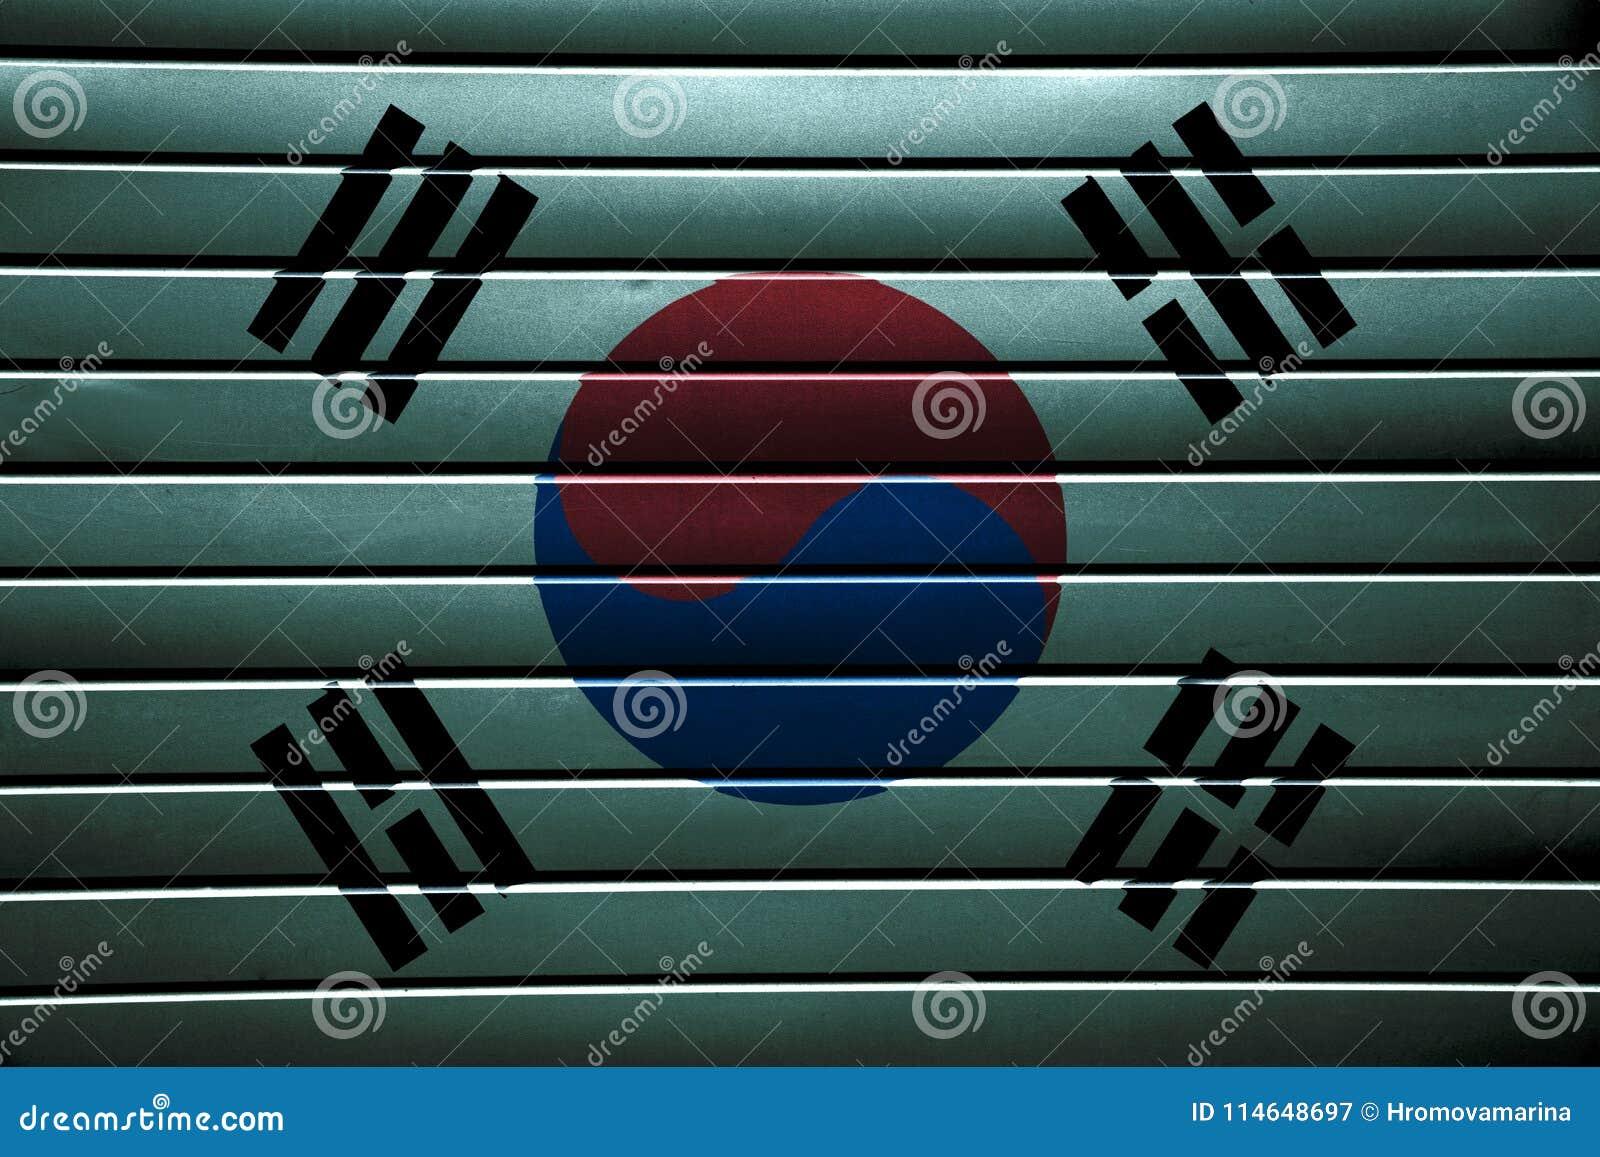 Texture of South Korea flag.